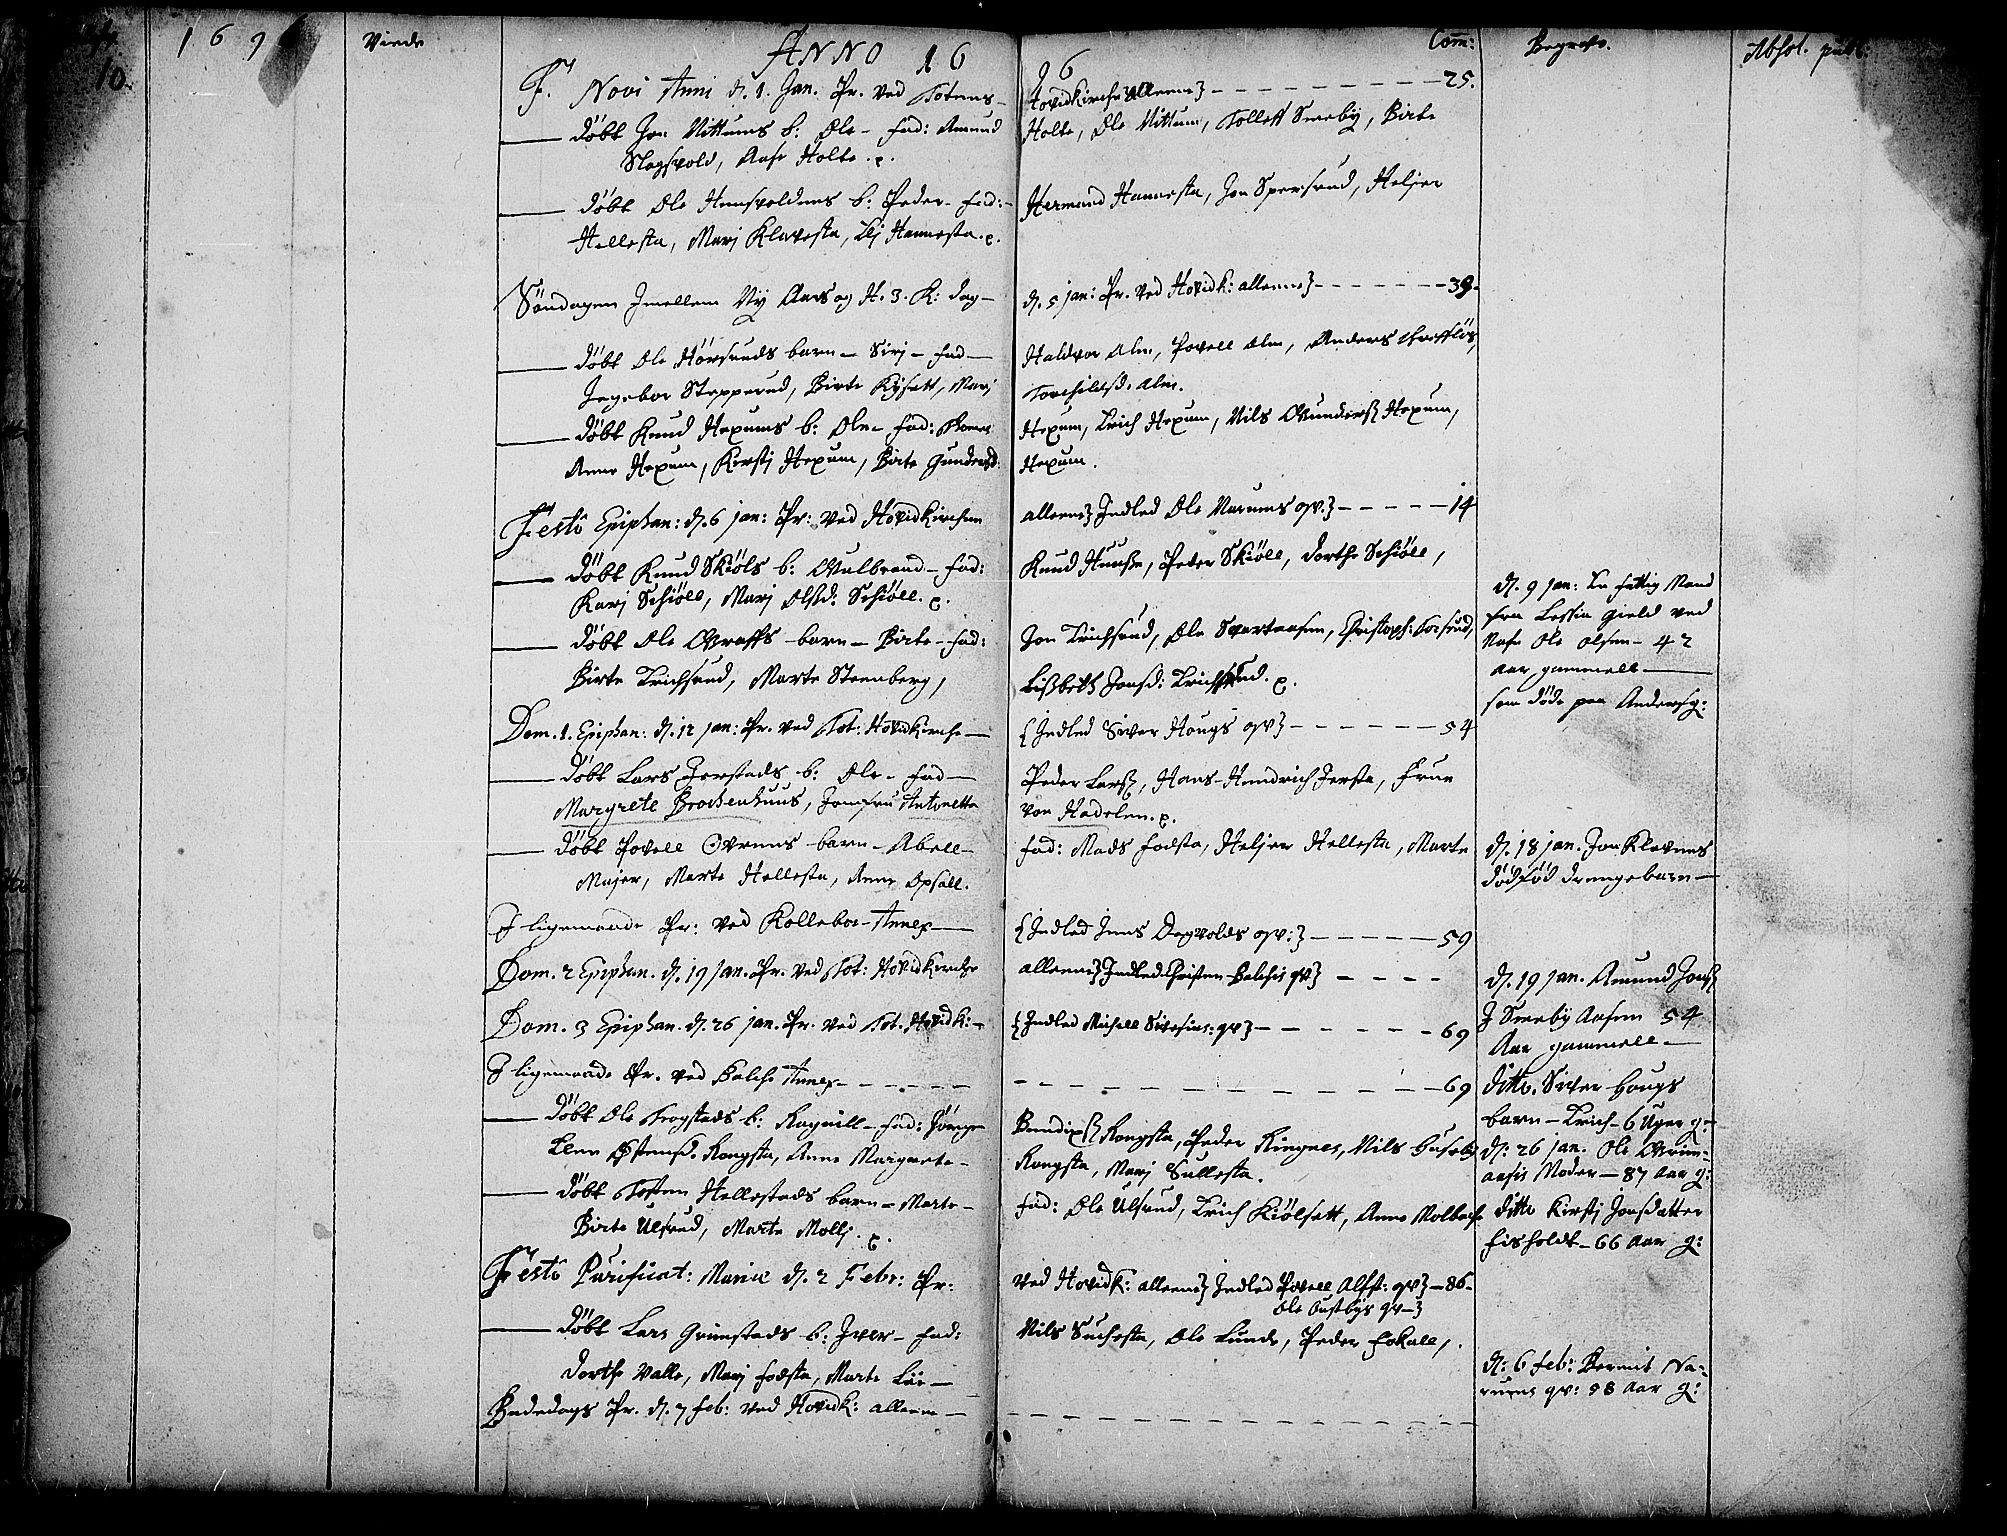 SAH, Toten prestekontor, Ministerialbok nr. 1, 1695-1713, s. 10